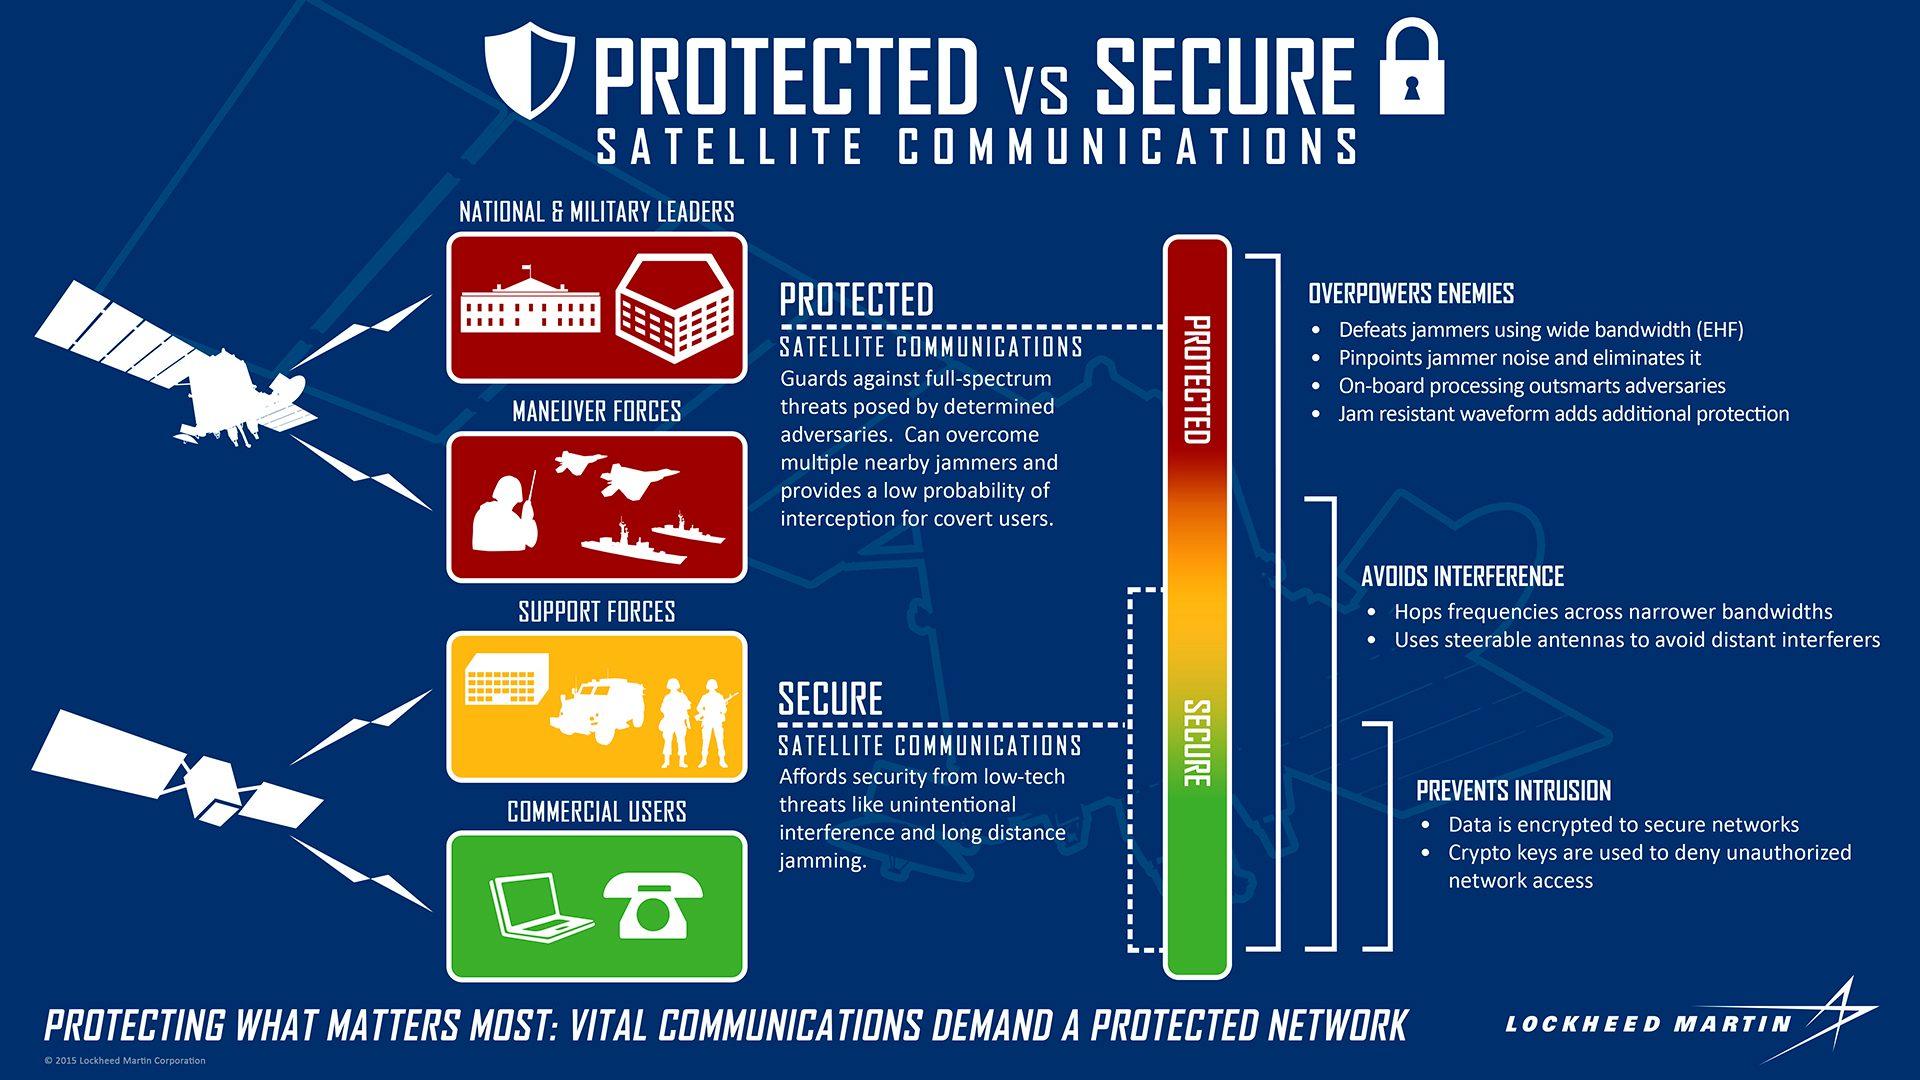 Protected-vs-Secure-Sat-Communication-infographic.jpg.pc-adaptive.1920.medium - Copy.jpeg